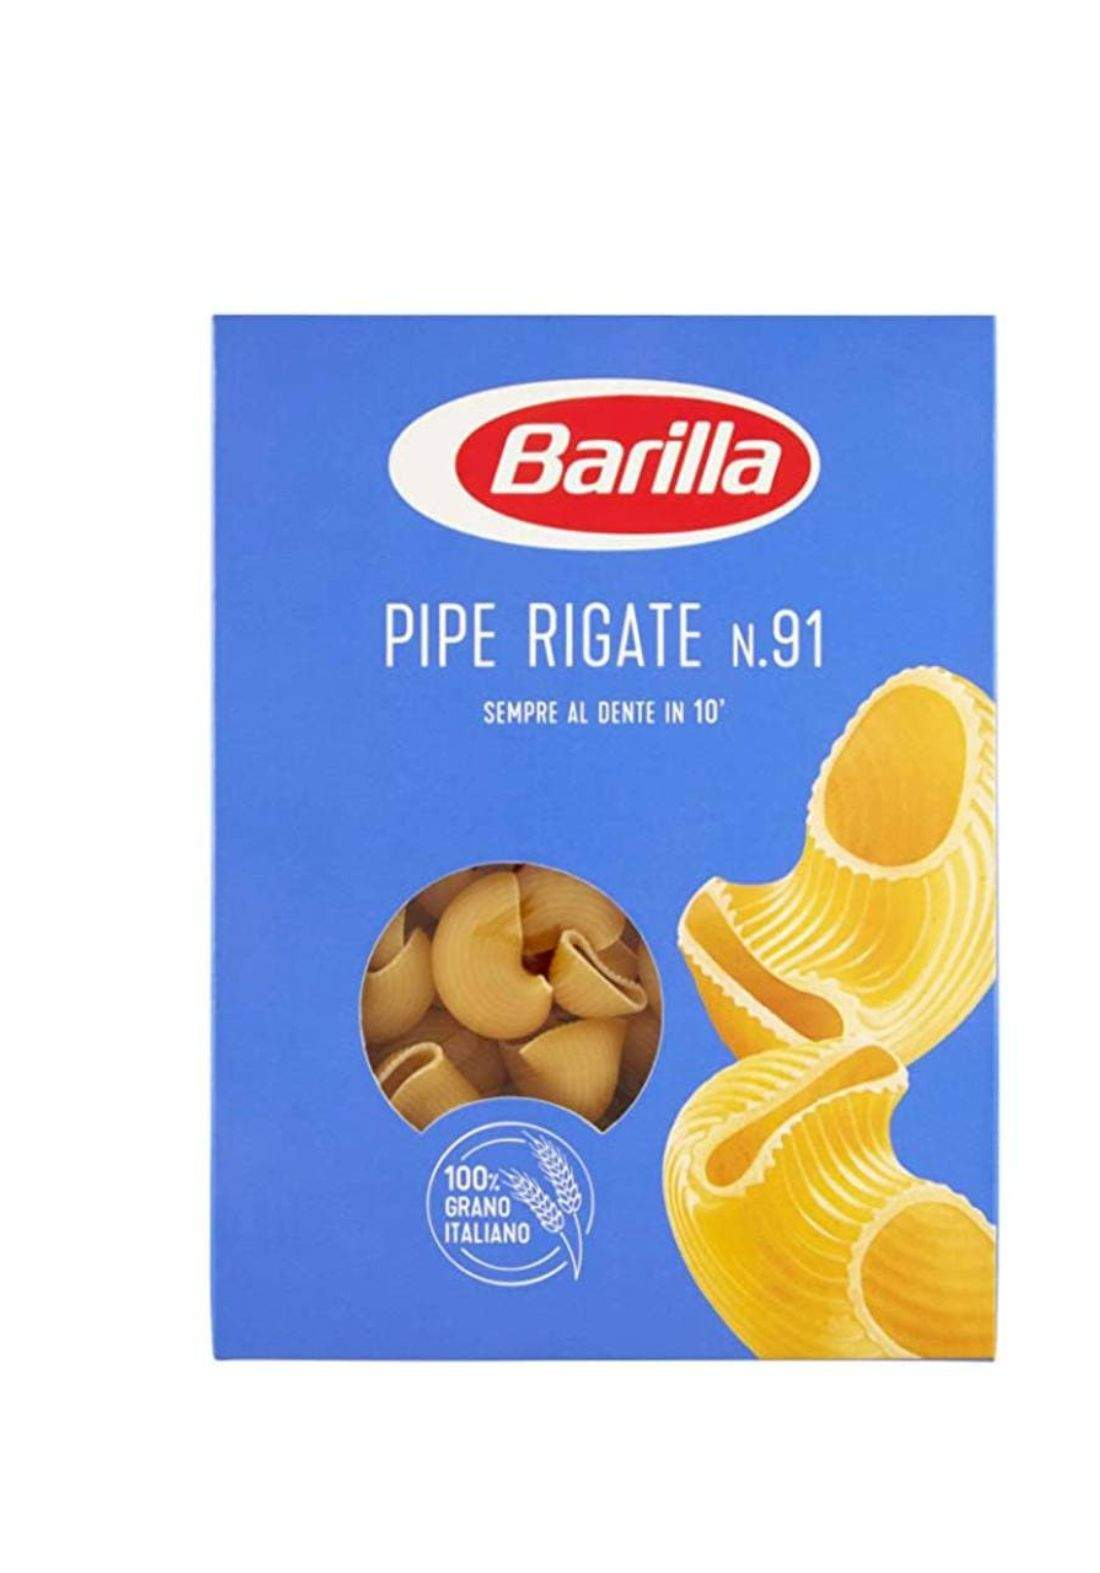 Barilla pasta 500g باستا